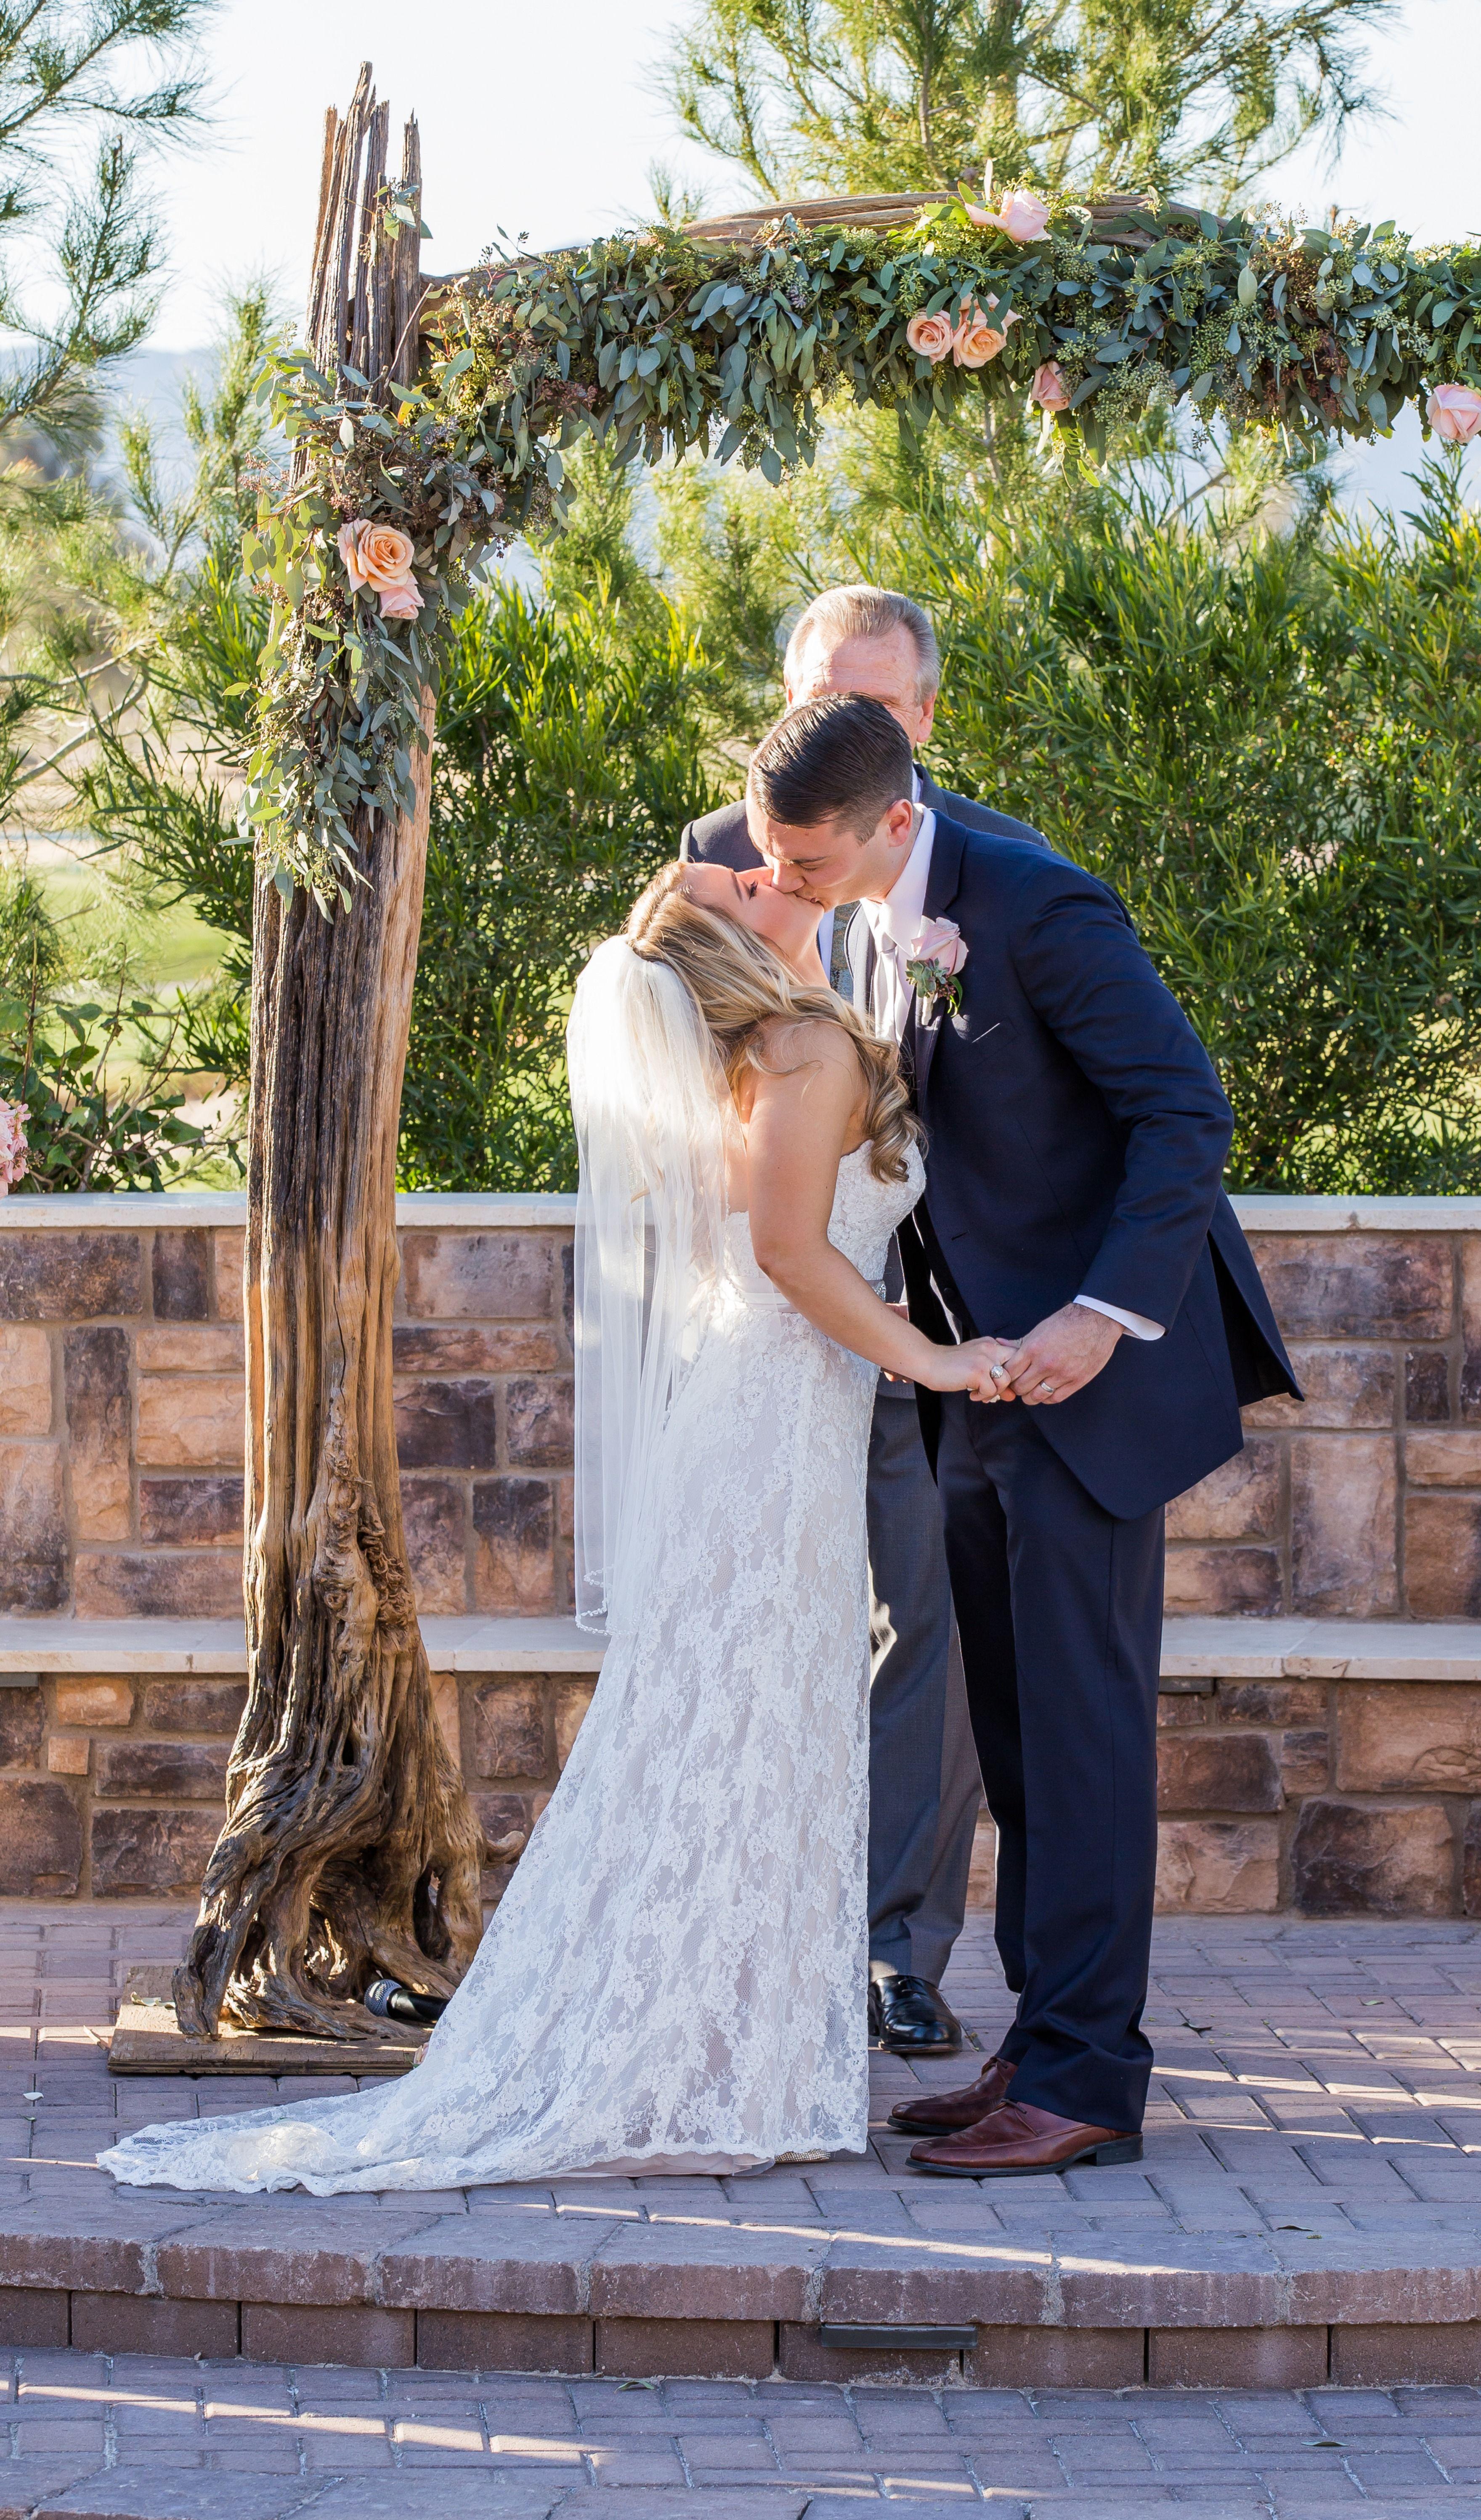 Newest Wedding Invitation Ideas Trends And Designs Phoenix